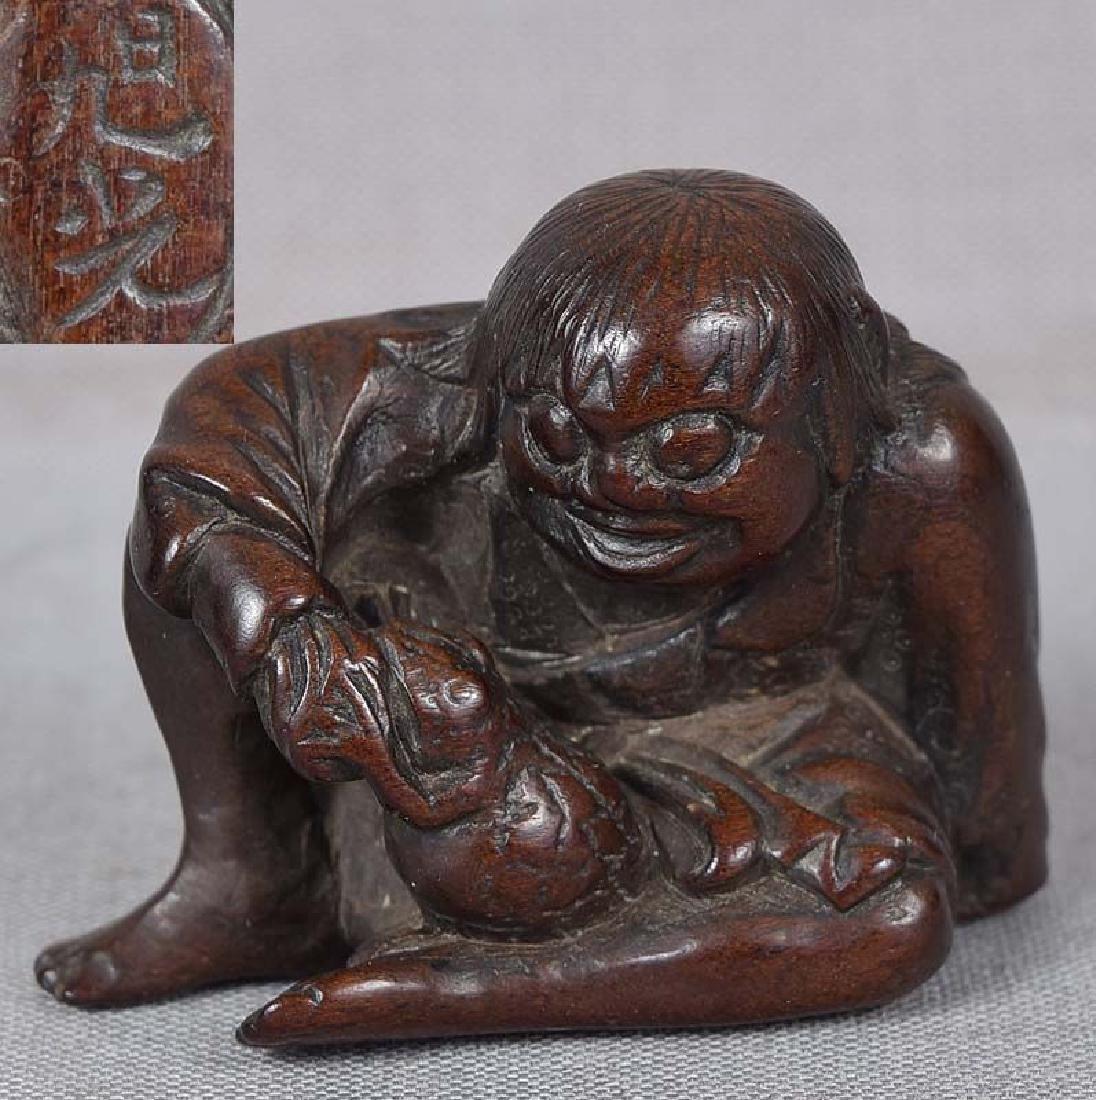 19th Century Netsuke Gama Sennin With Toad by Kyokko